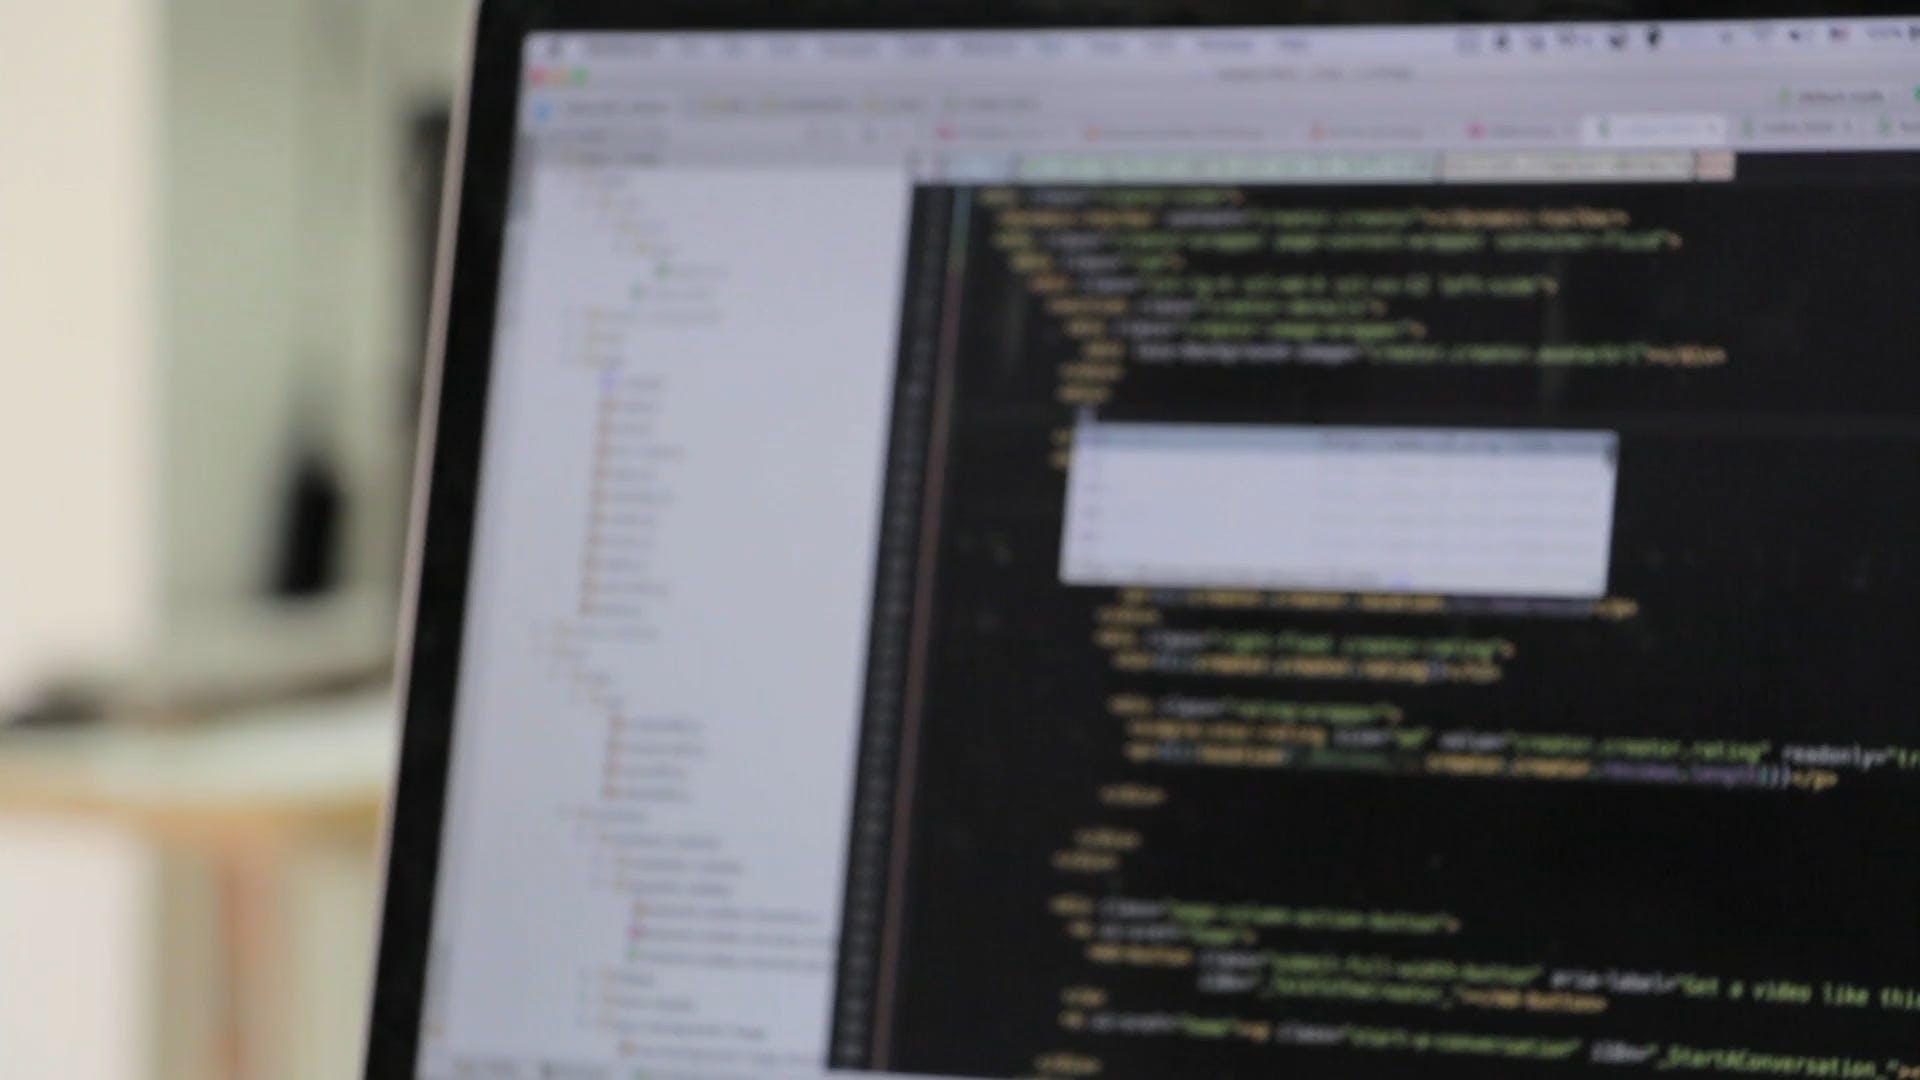 laptop screen code browser technology